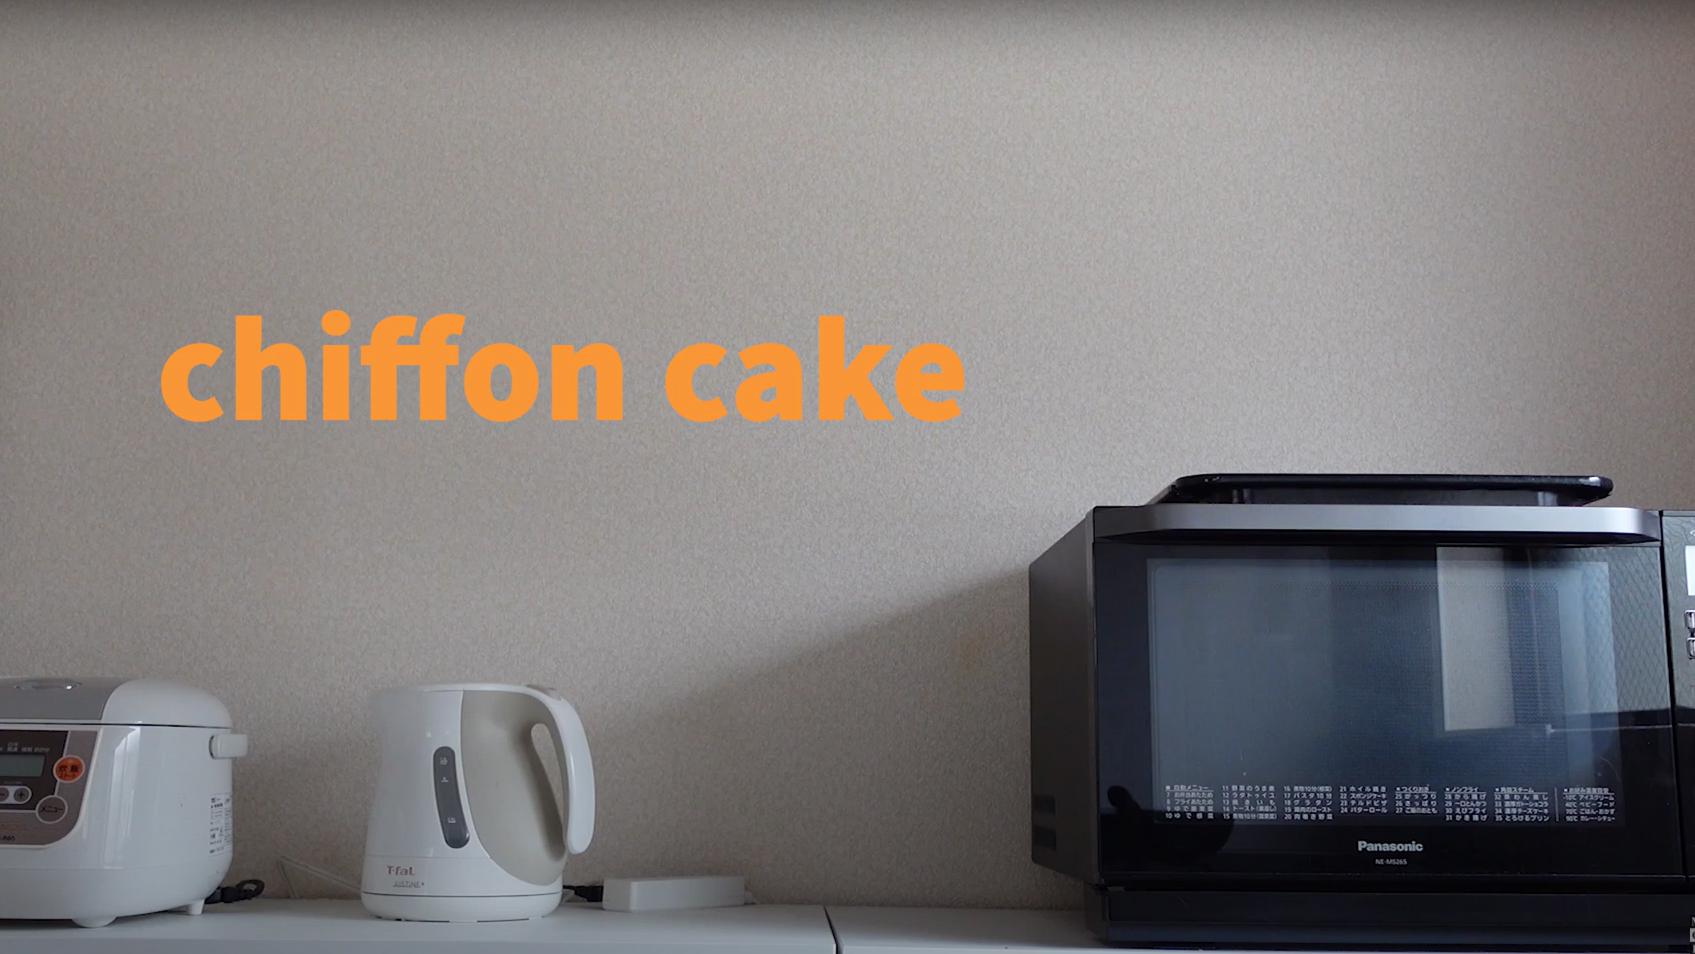 【SONY】VLOGCAM ZV-1とシフォンケーキの甘いお話